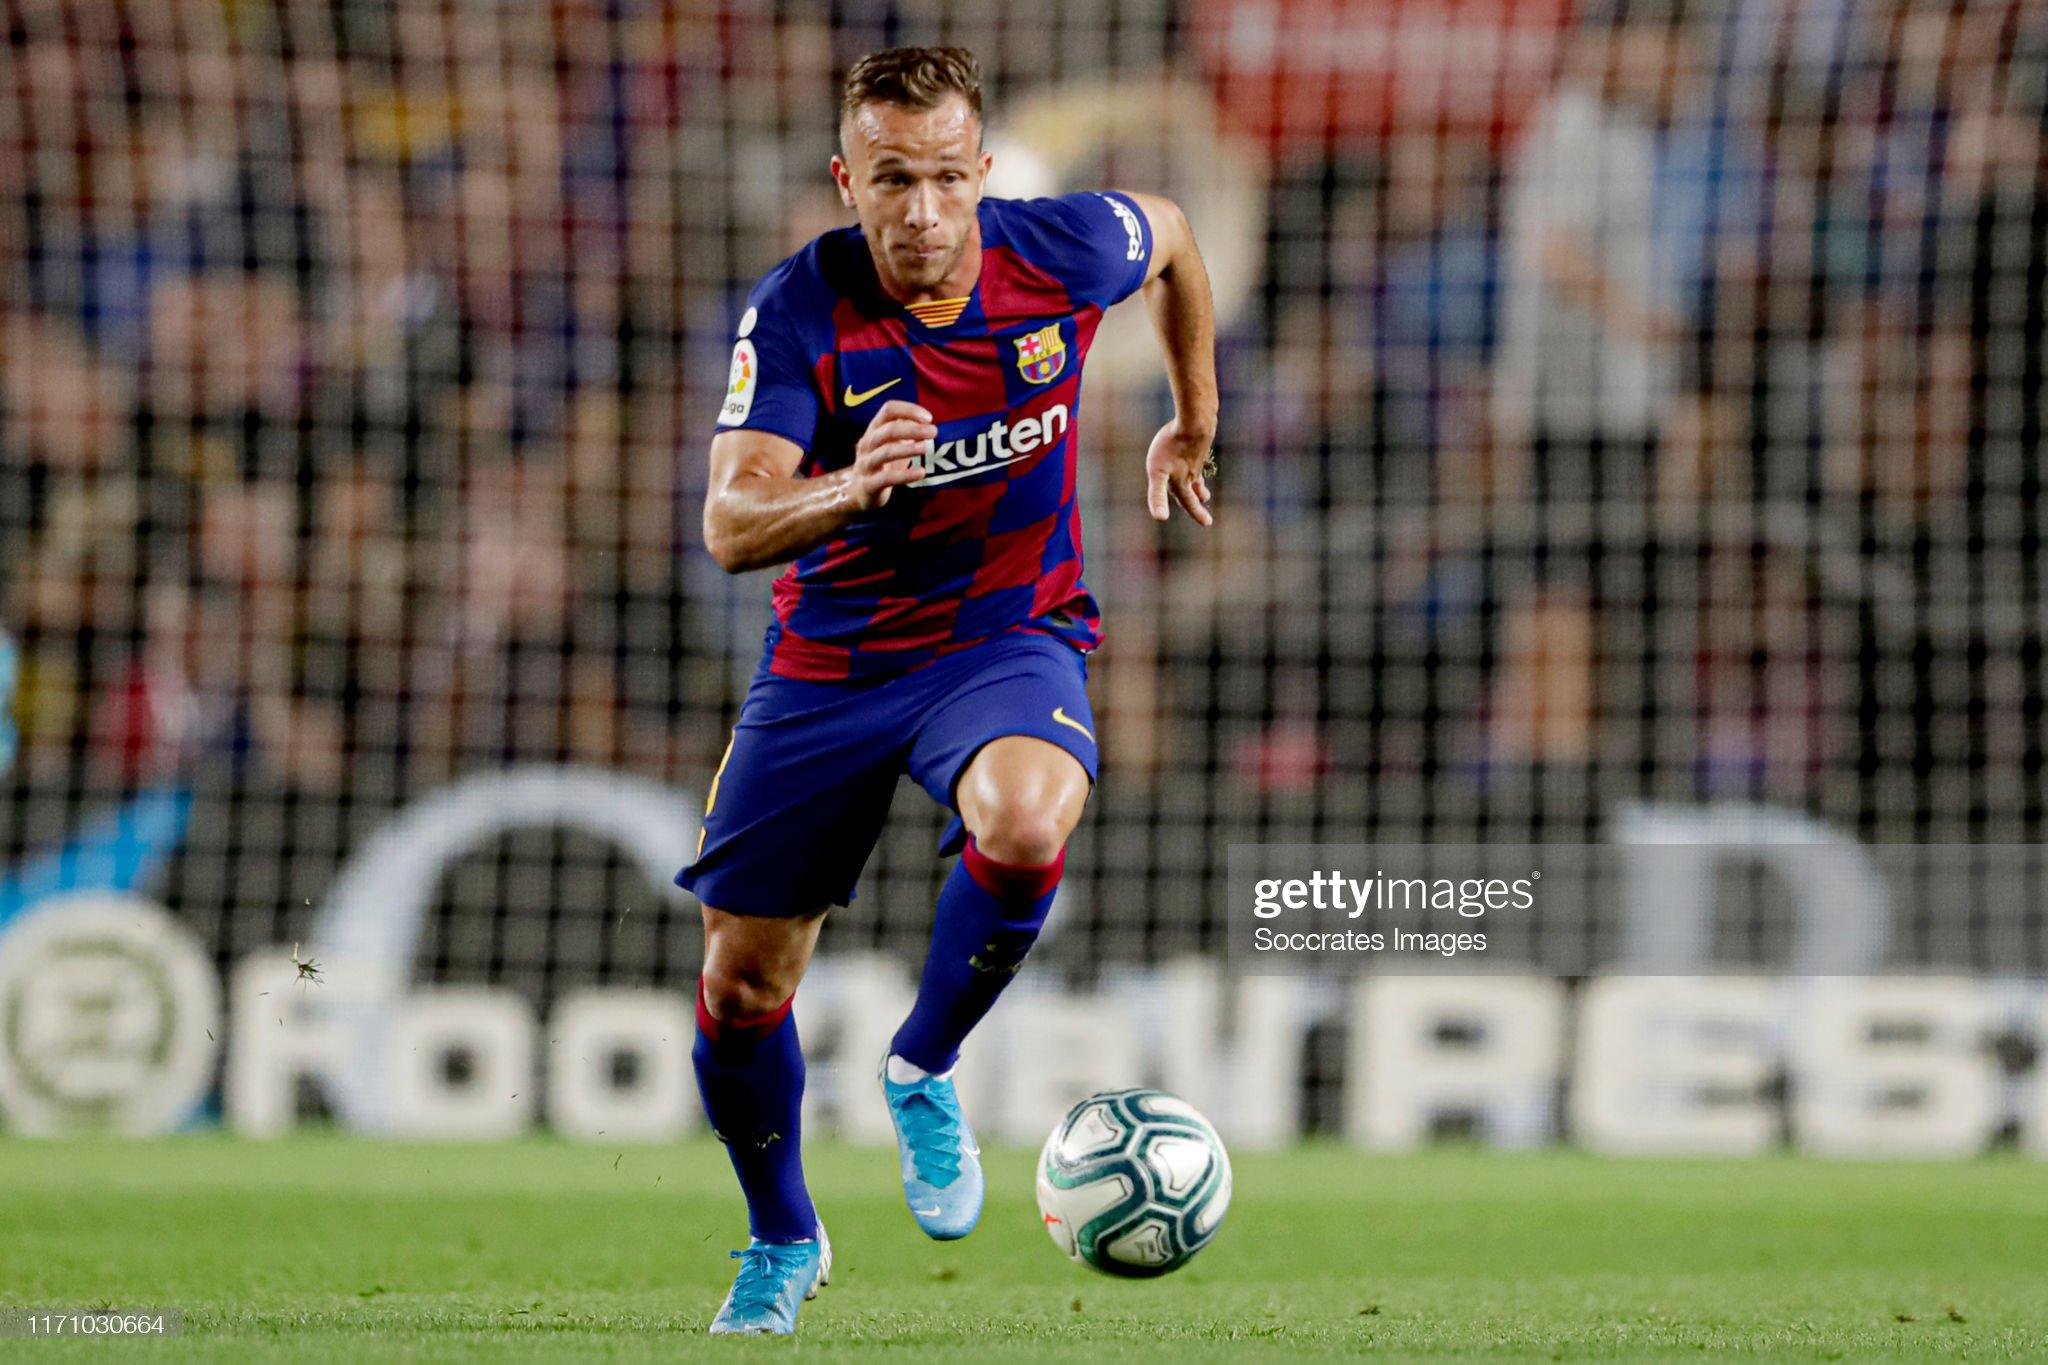 صور مباراة : برشلونة - فياريال 2-1 ( 24-09-2019 )  Arthur-of-fc-barcelona-during-the-la-liga-santander-match-between-fc-picture-id1171030664?s=2048x2048